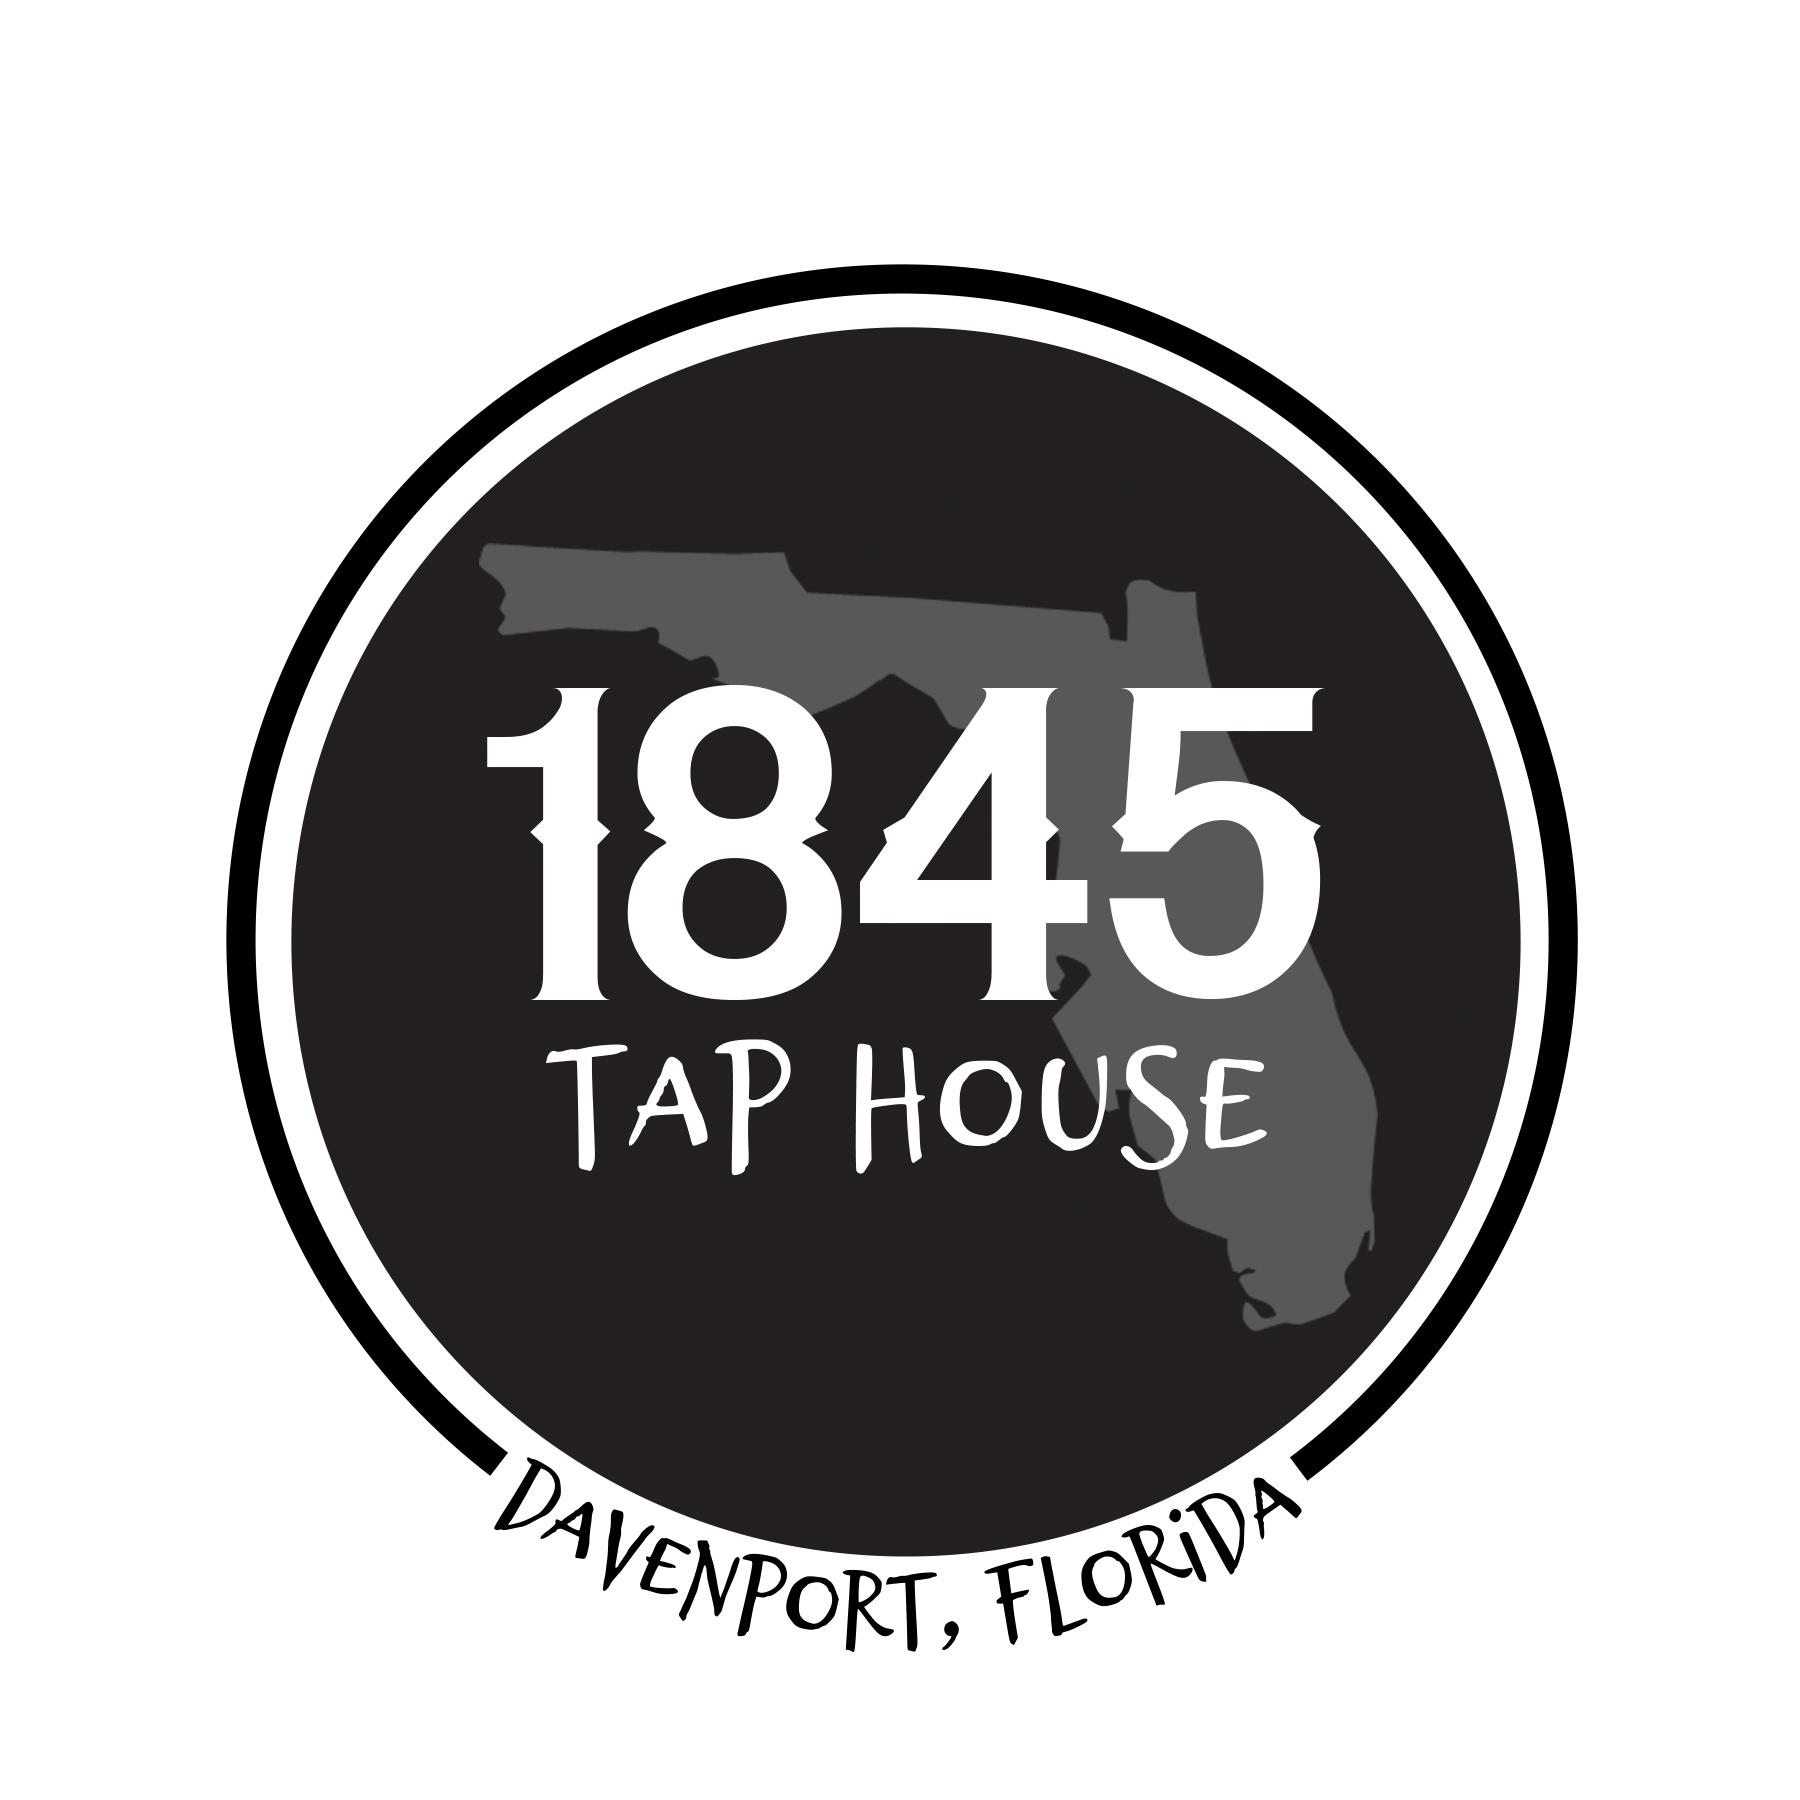 1845 taphouse logo FL 02